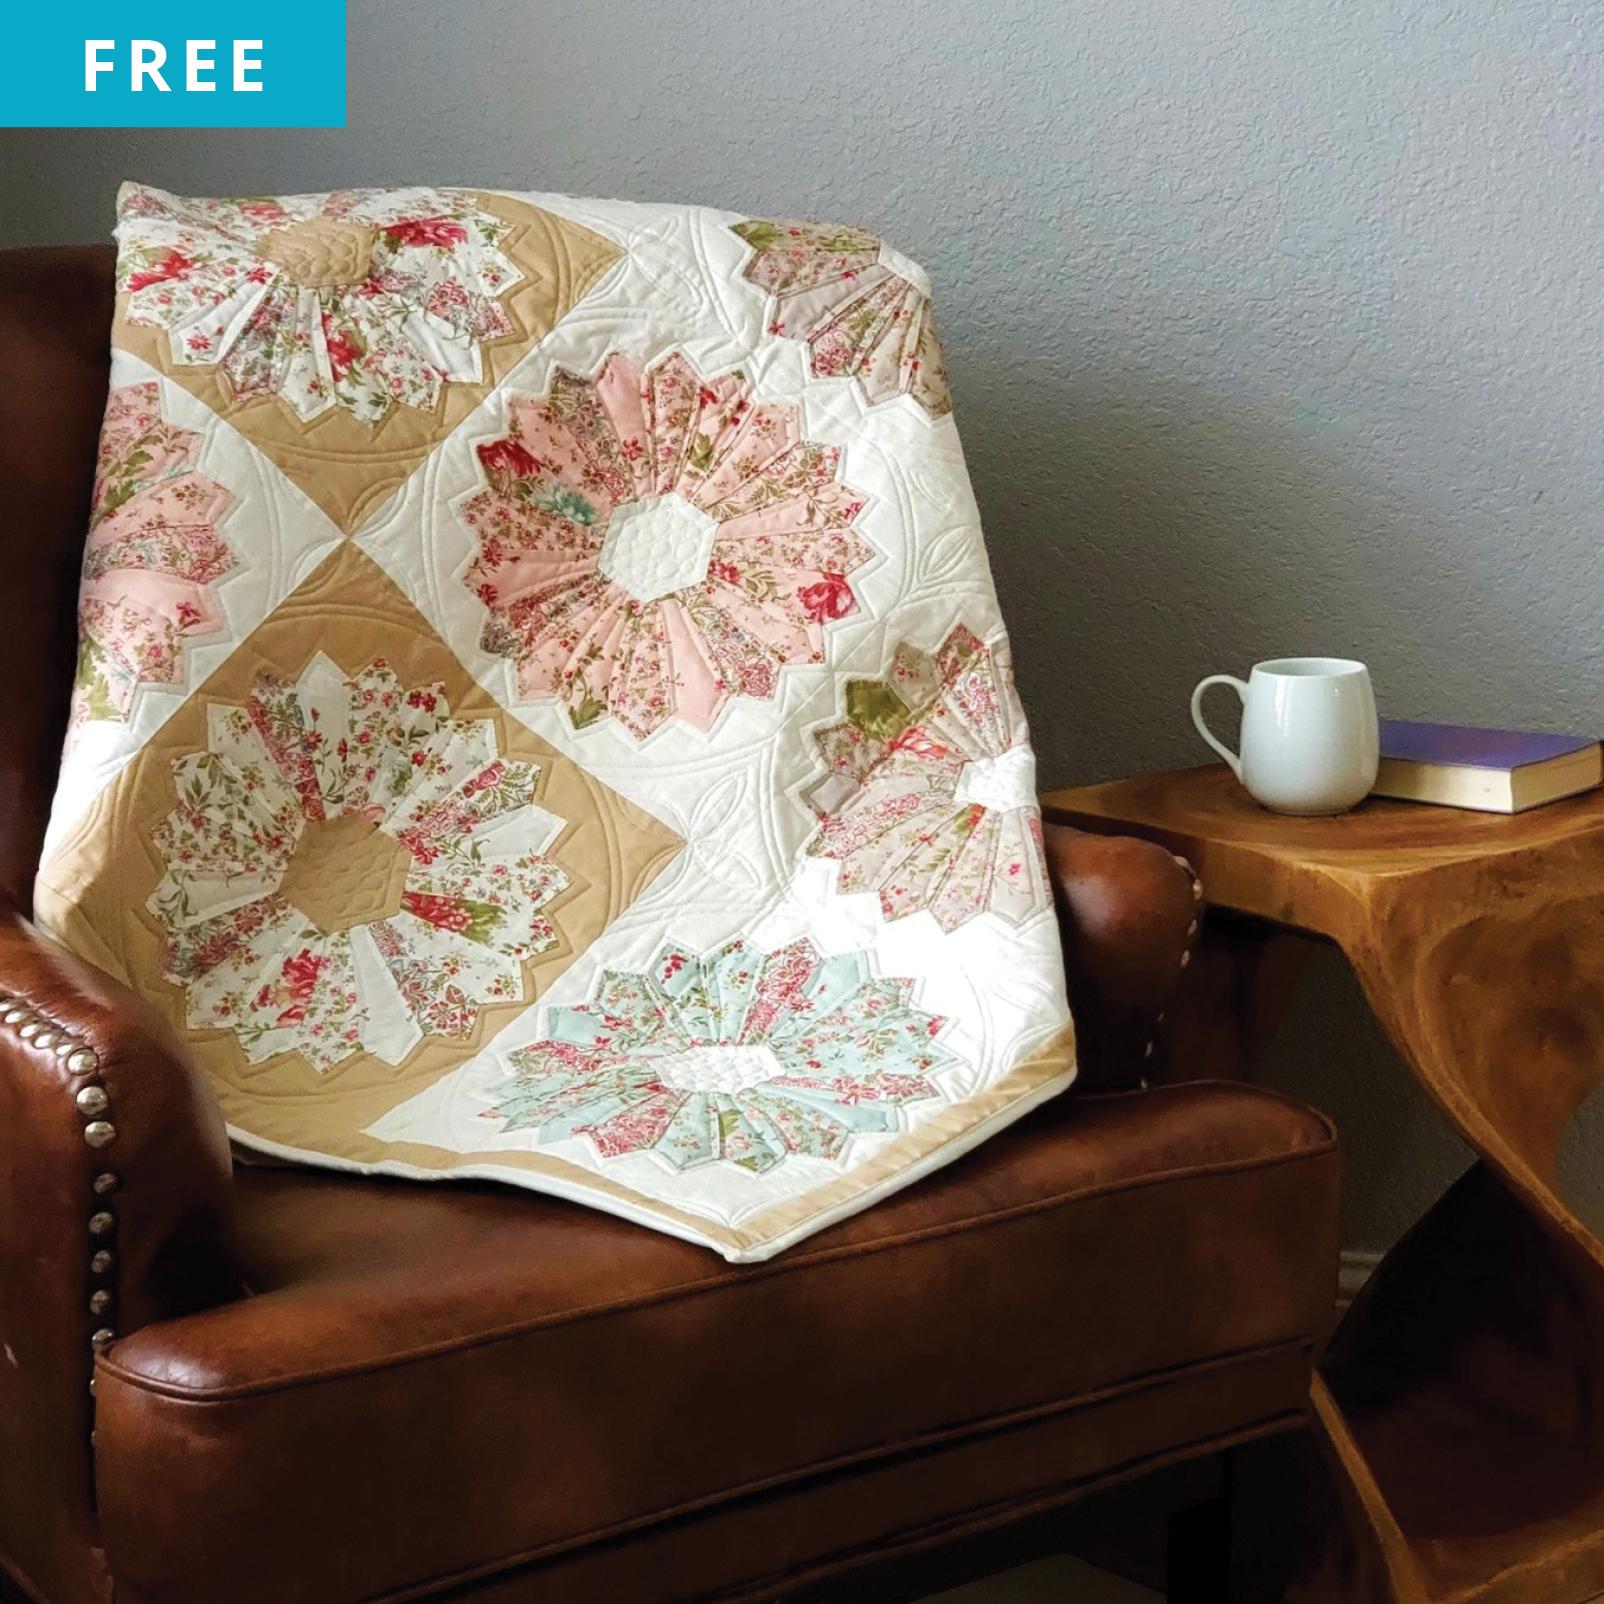 Free Quilt Pattern - Dresden Delight Quilt Pattern